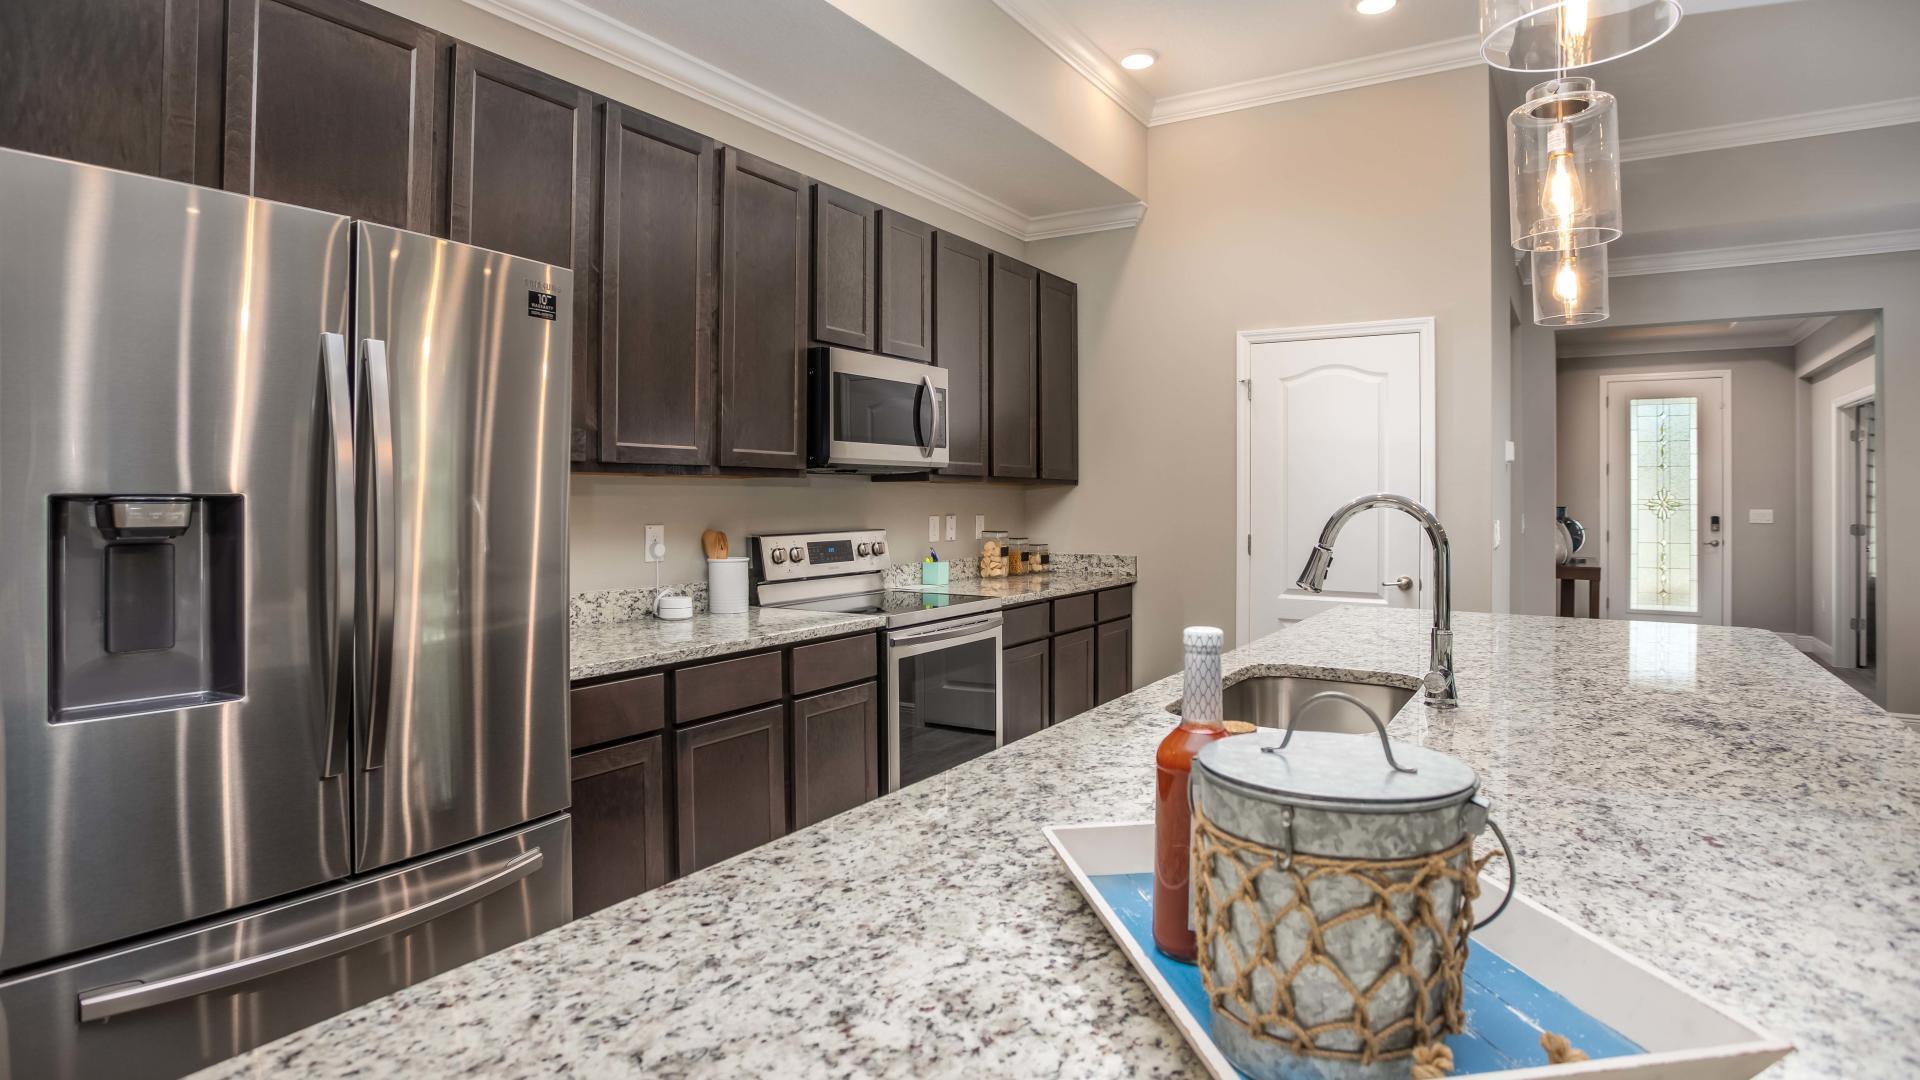 Kitchen featured in the Harmony By Maronda Homes in Daytona Beach, FL